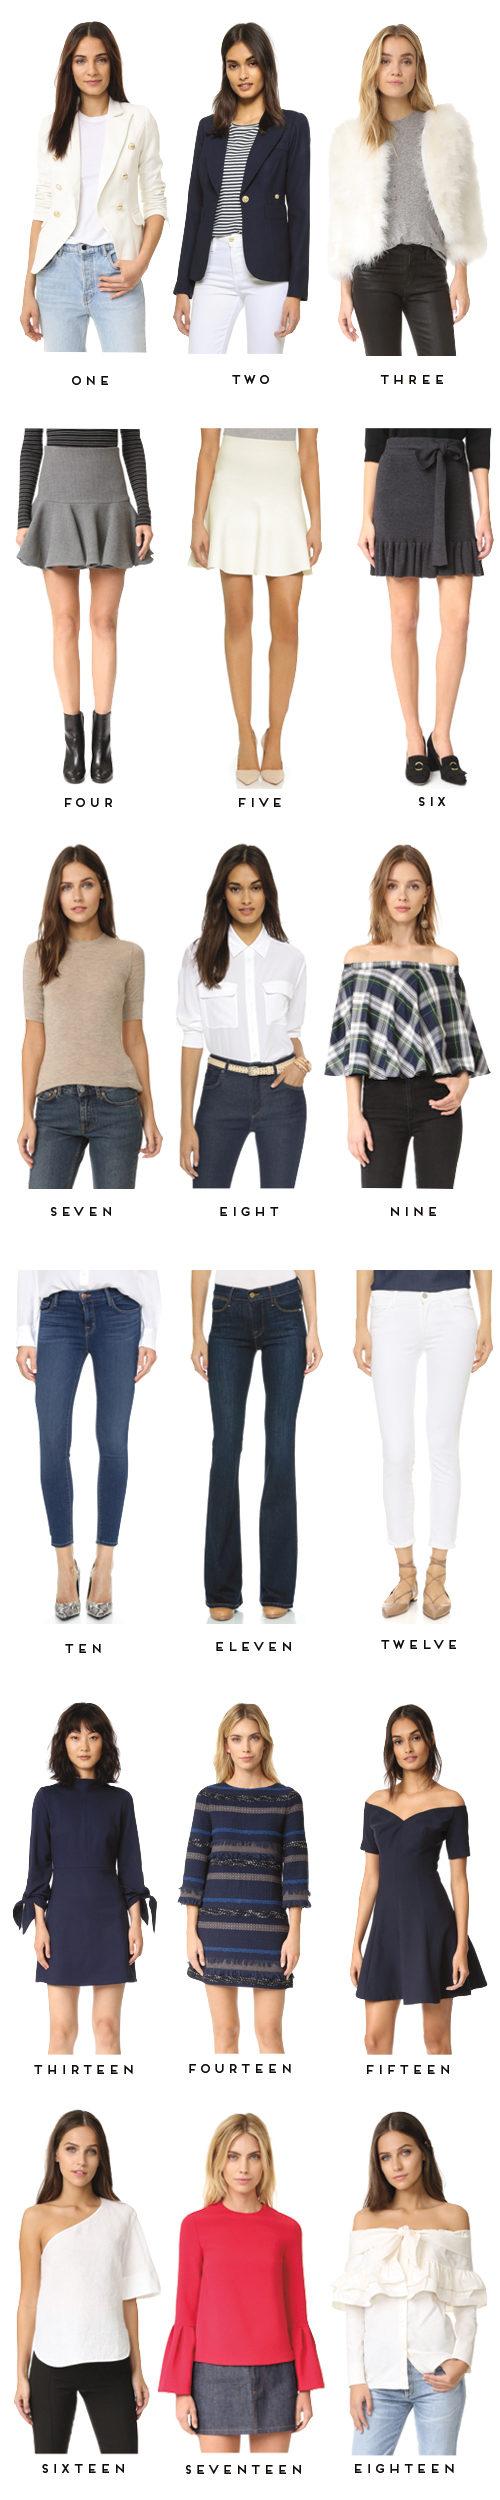 shopbop-fall-sale-picks